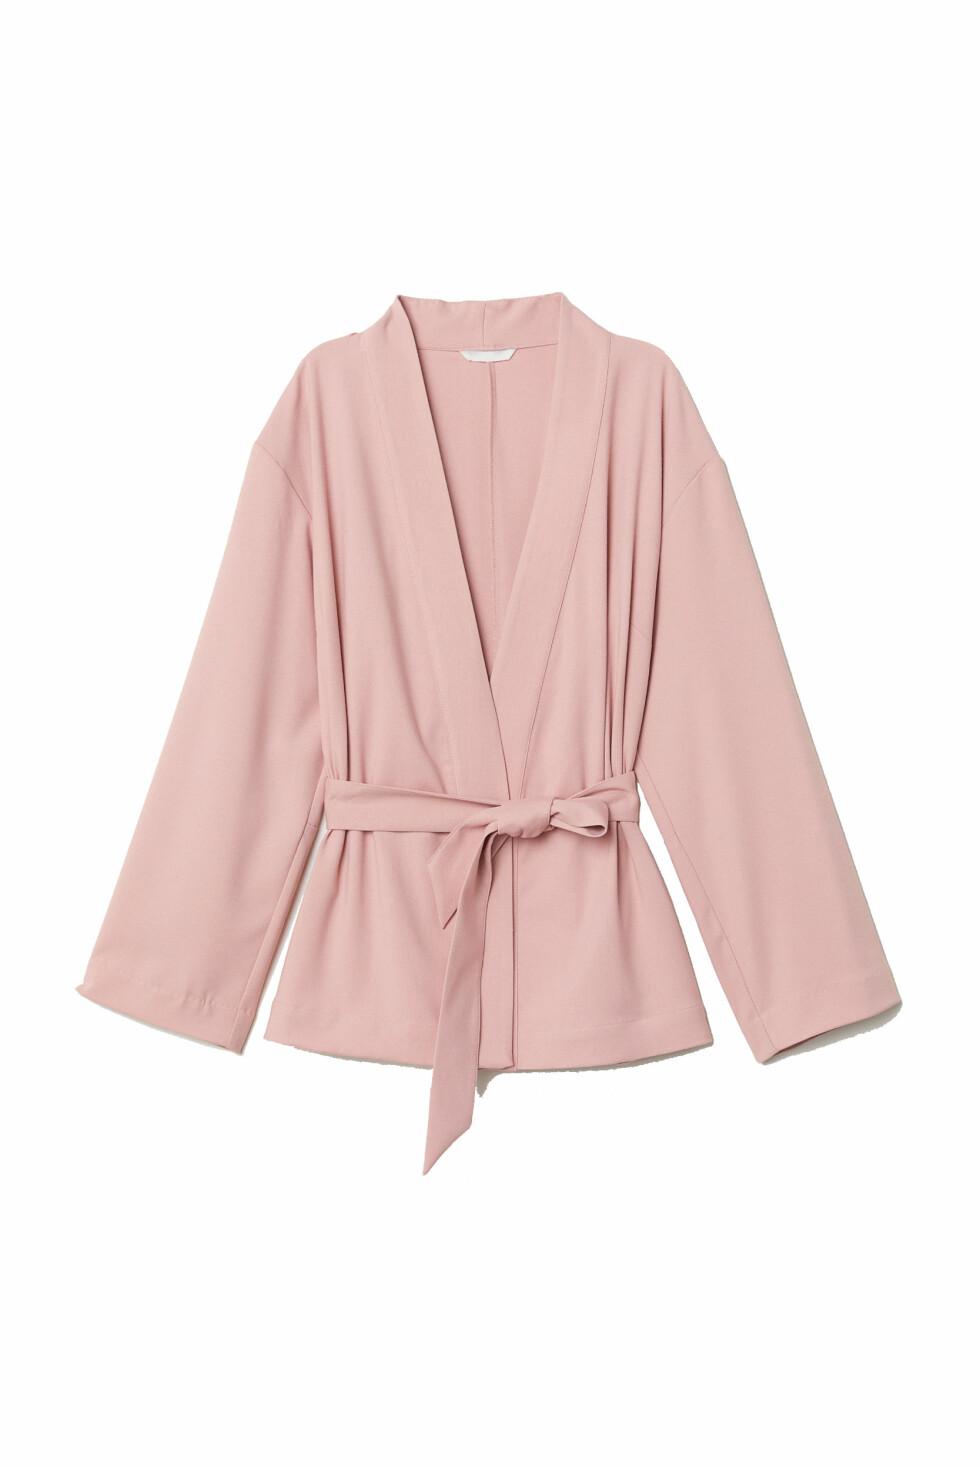 Kimono fra H&M |300,-| https://www2.hm.com/no_no/productpage.0665612003.html